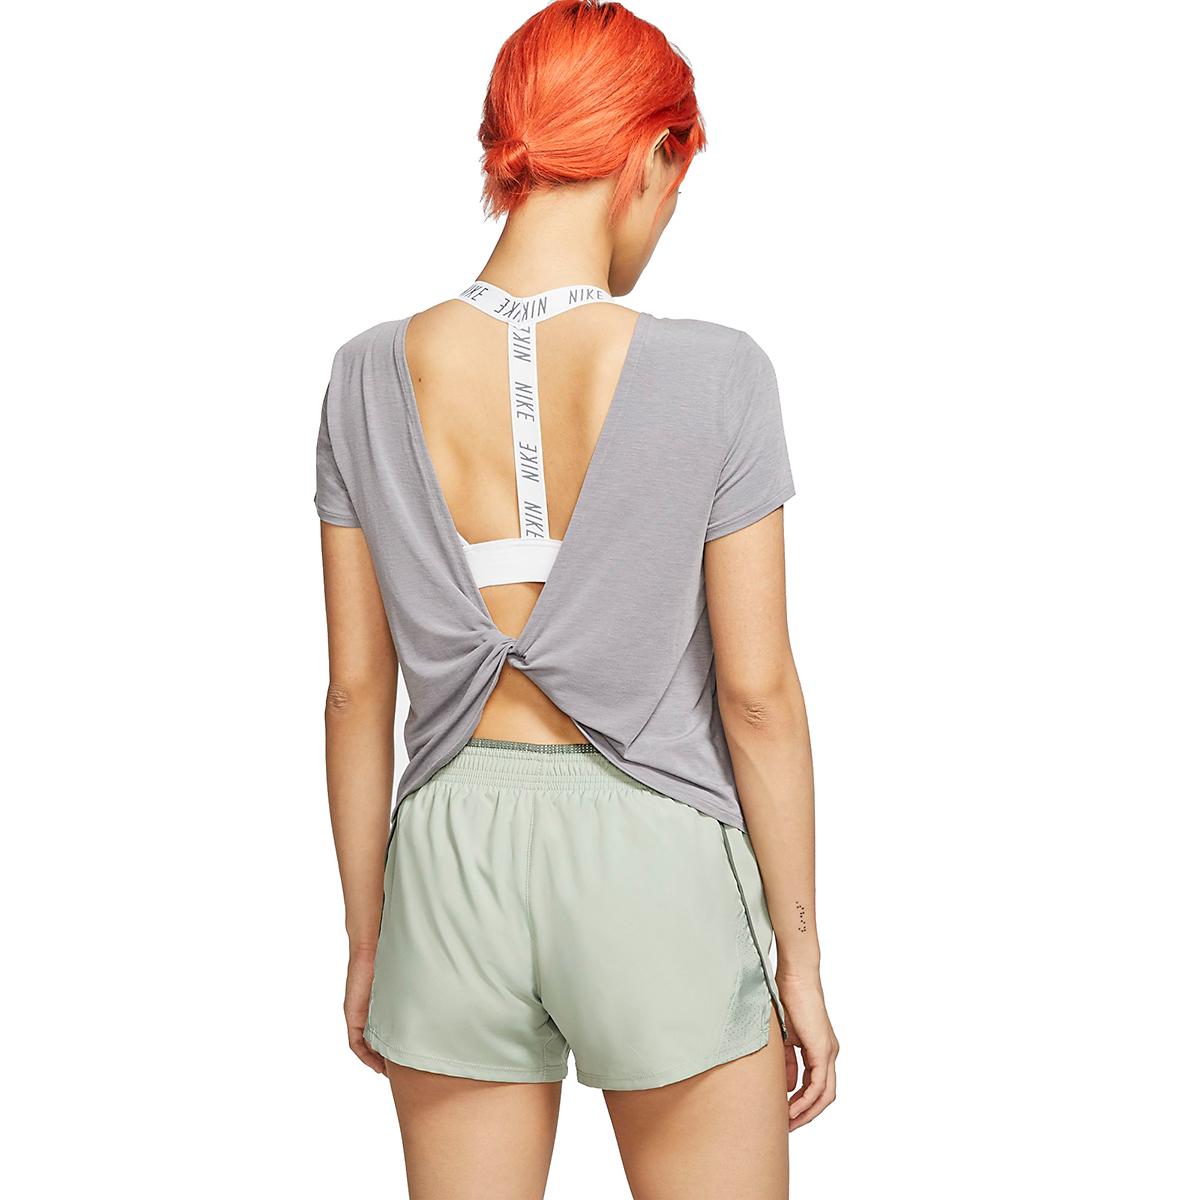 Women's Nike Twist Top Short Sleeve   - Color: Gunsmoke/Heather - Size: XL, Gunsmoke/Heather, large, image 2